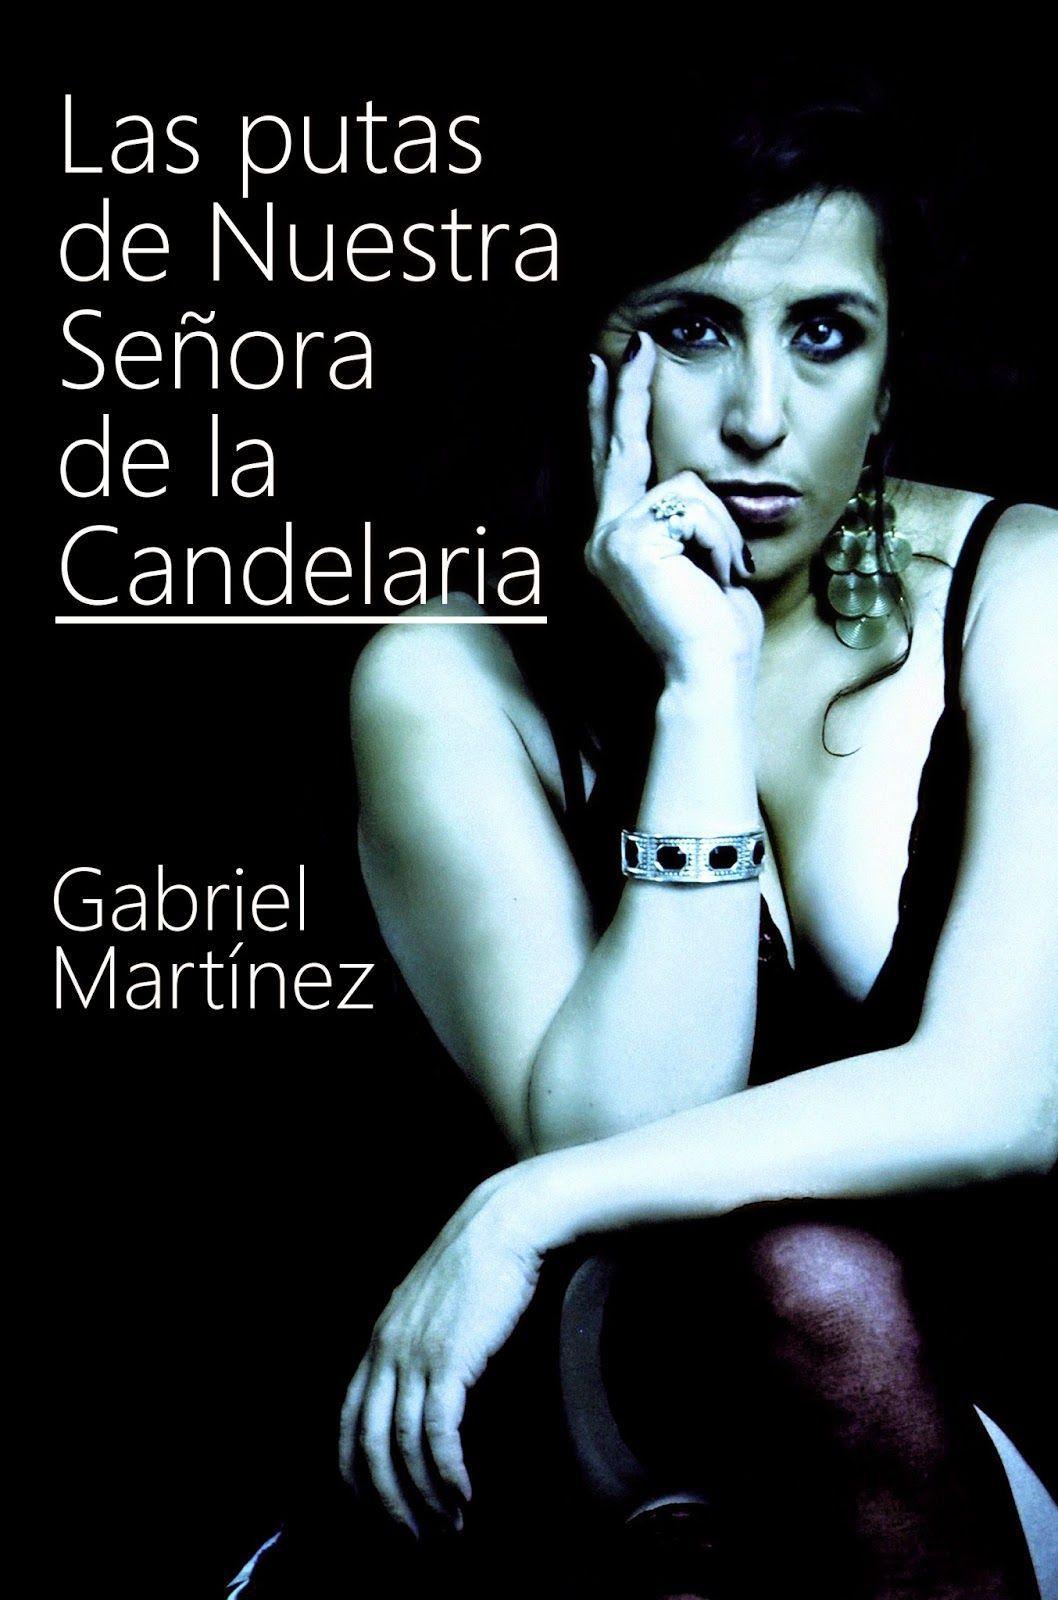 tarifas prostitutas españa novelas sobre prostitutas